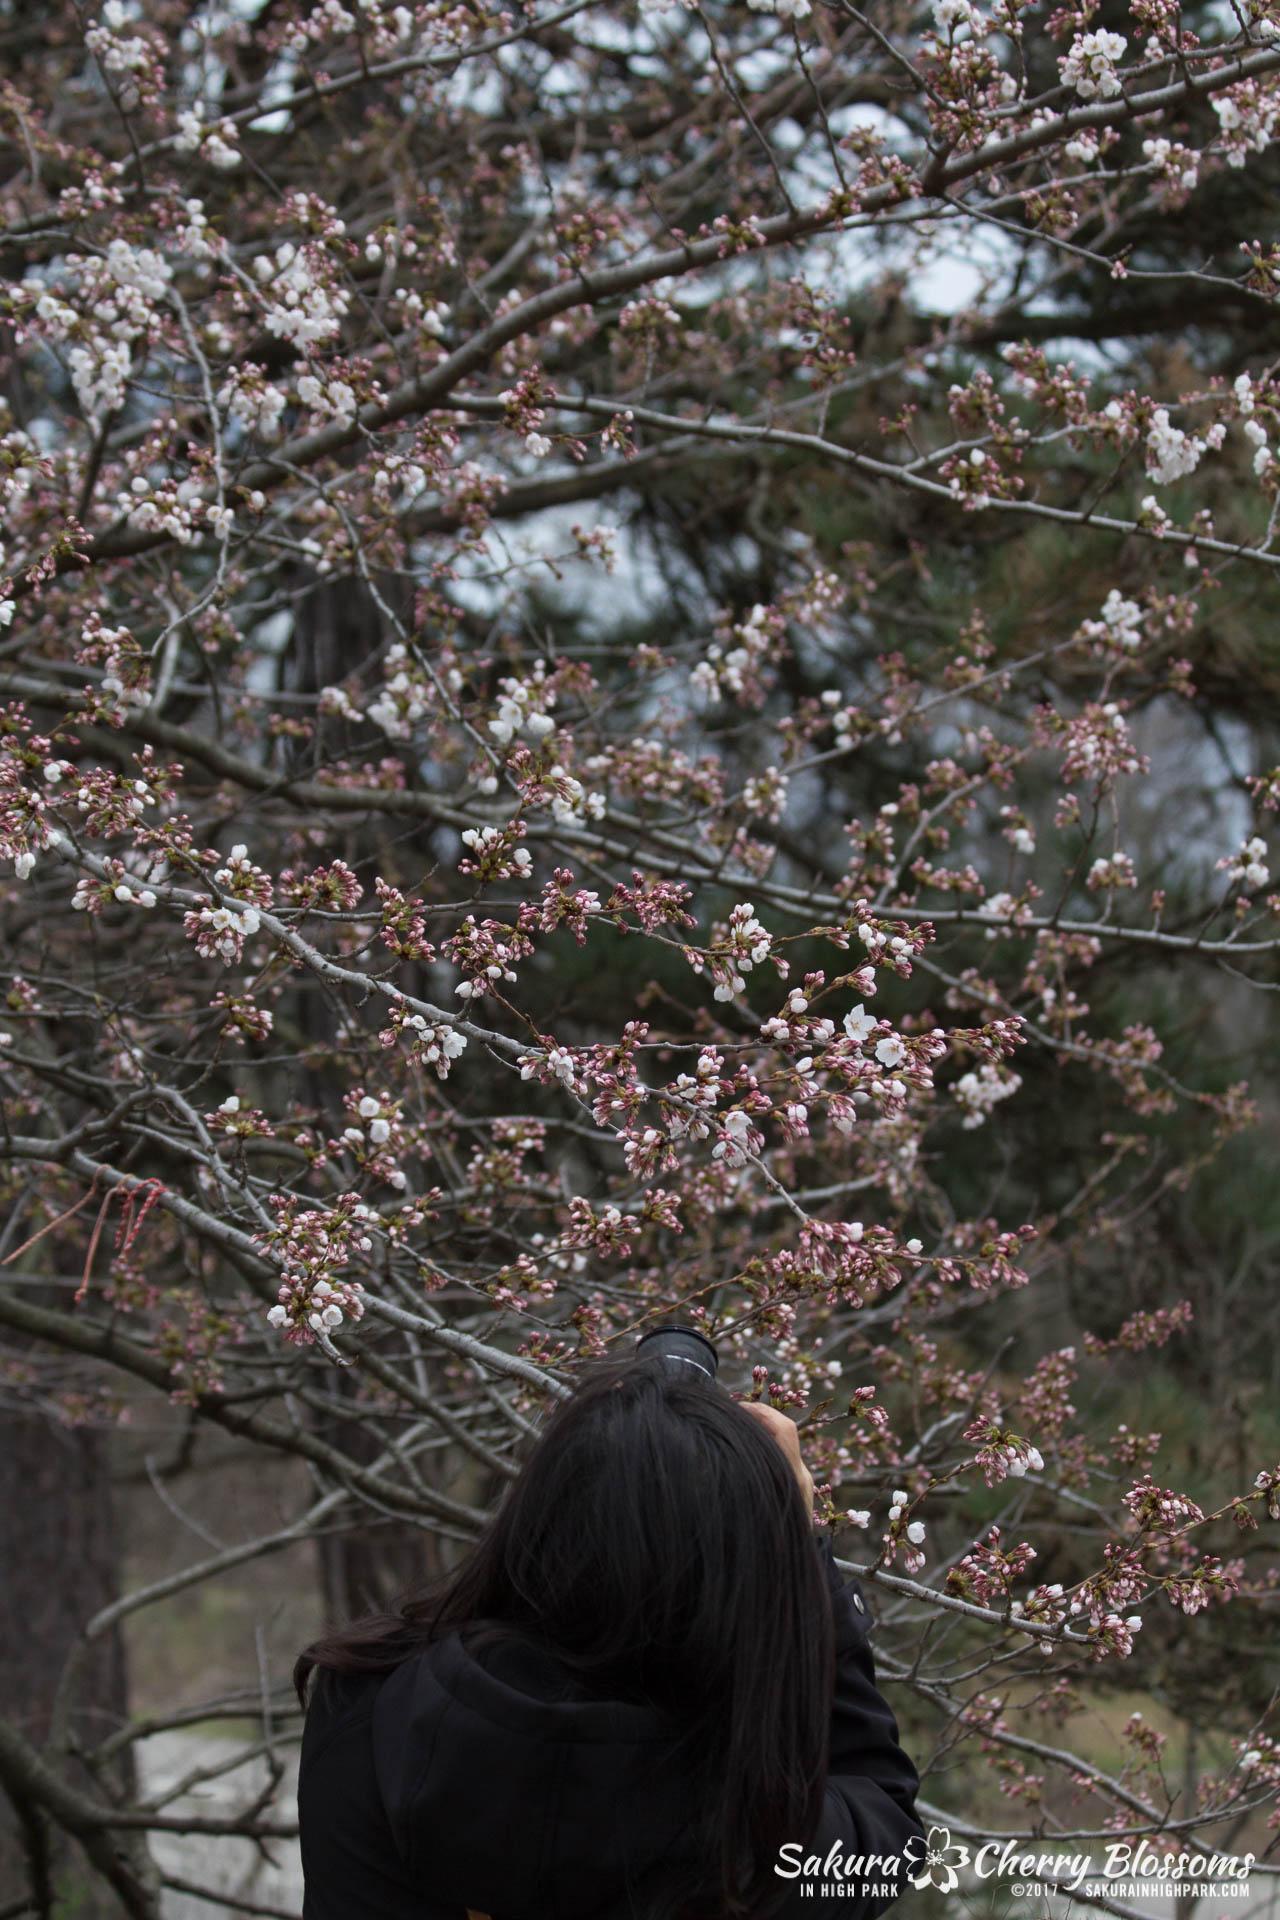 Sakura-Watch-April-21-2017-bloom-still-in-early-stages-30.jpg